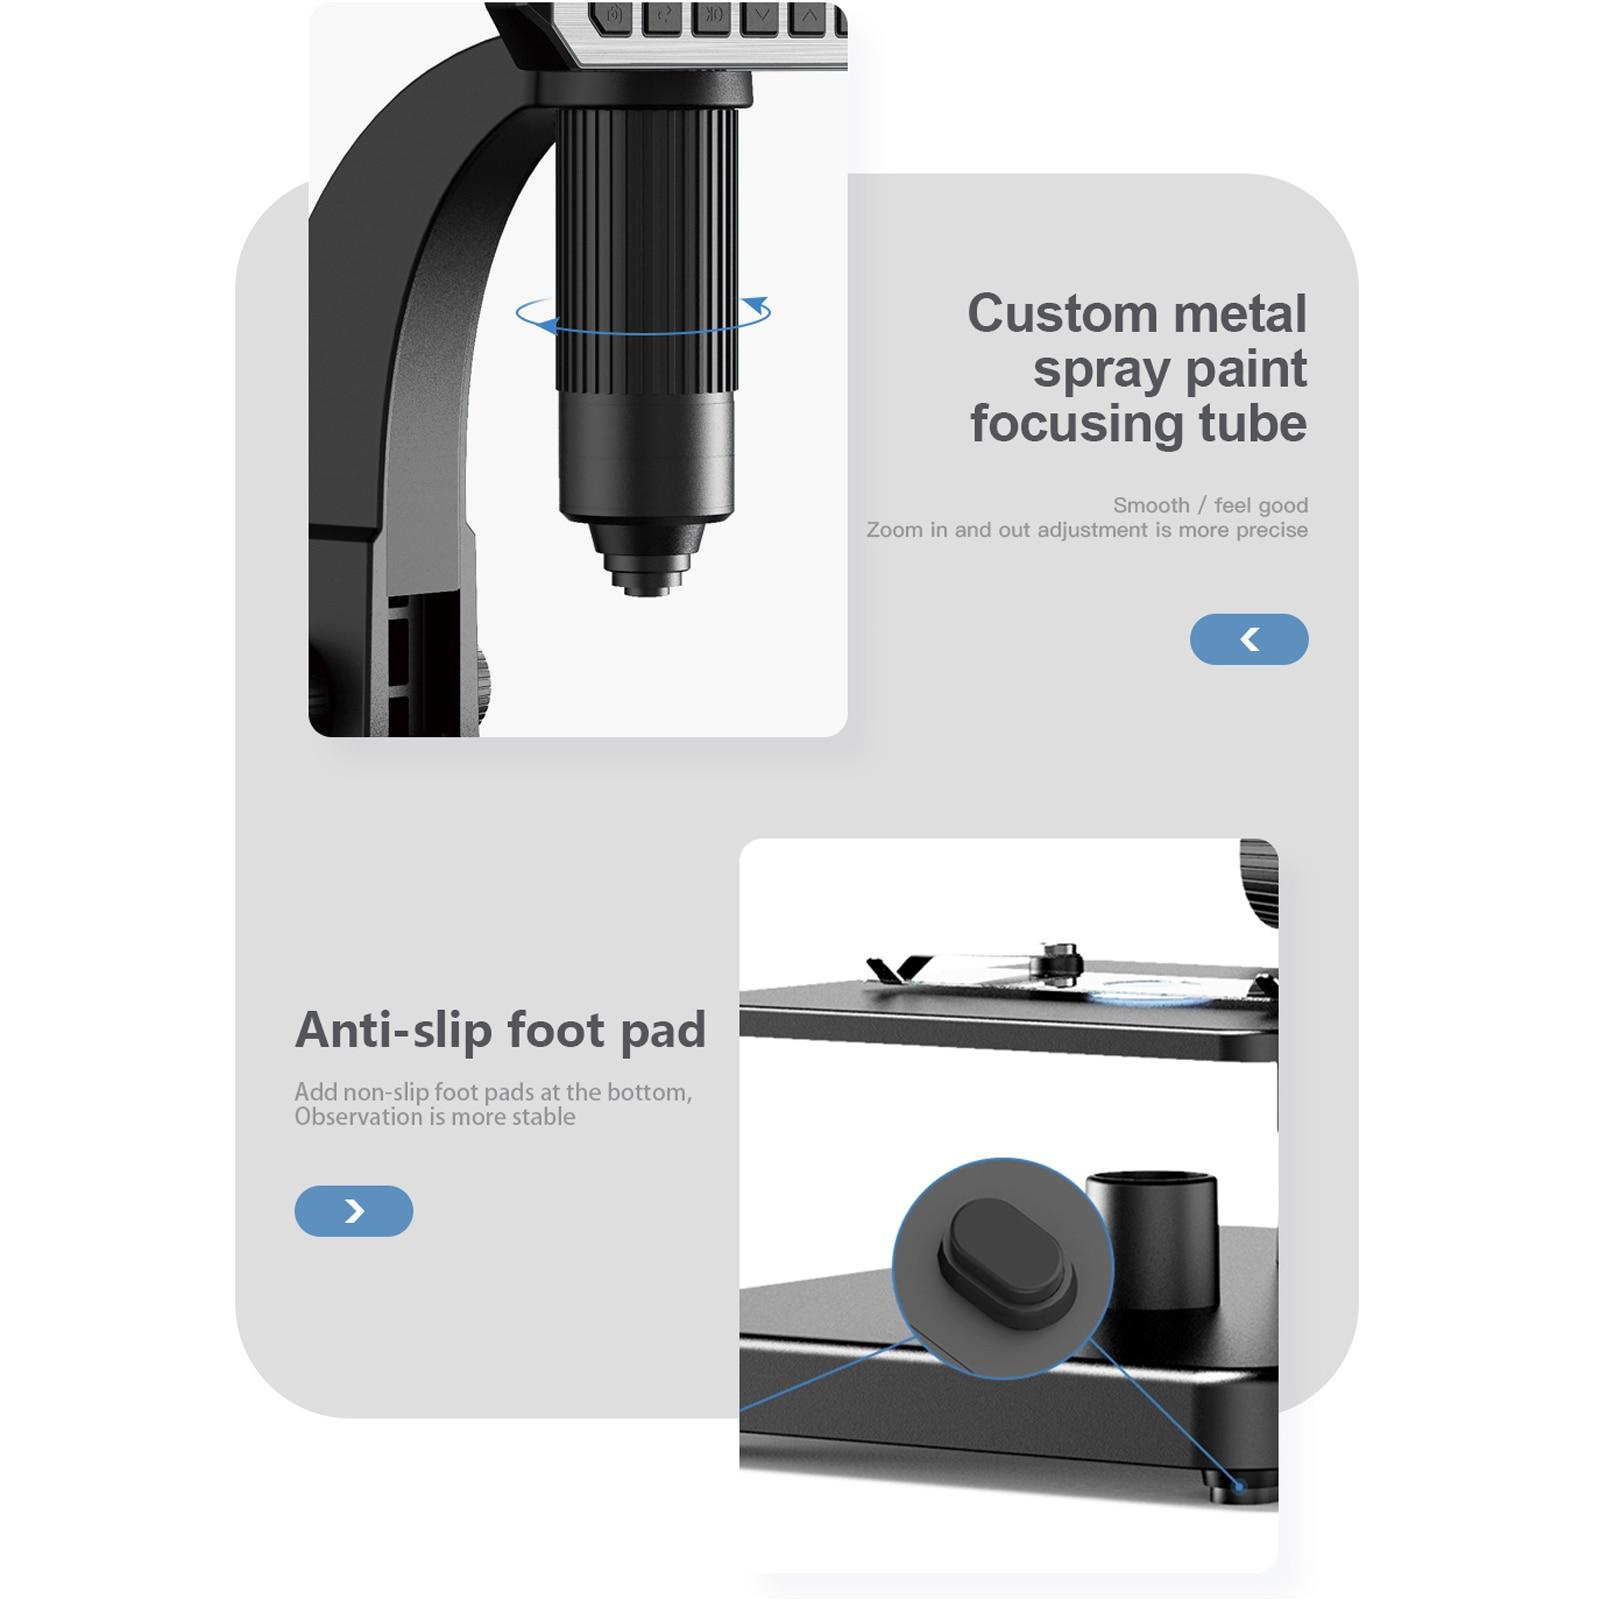 Tools : Inskam315 7 Inch IPS High Definition Screen Industrial Digital Microscope Camera 0-2000x Multipurpose Tool Dual LED Light Source